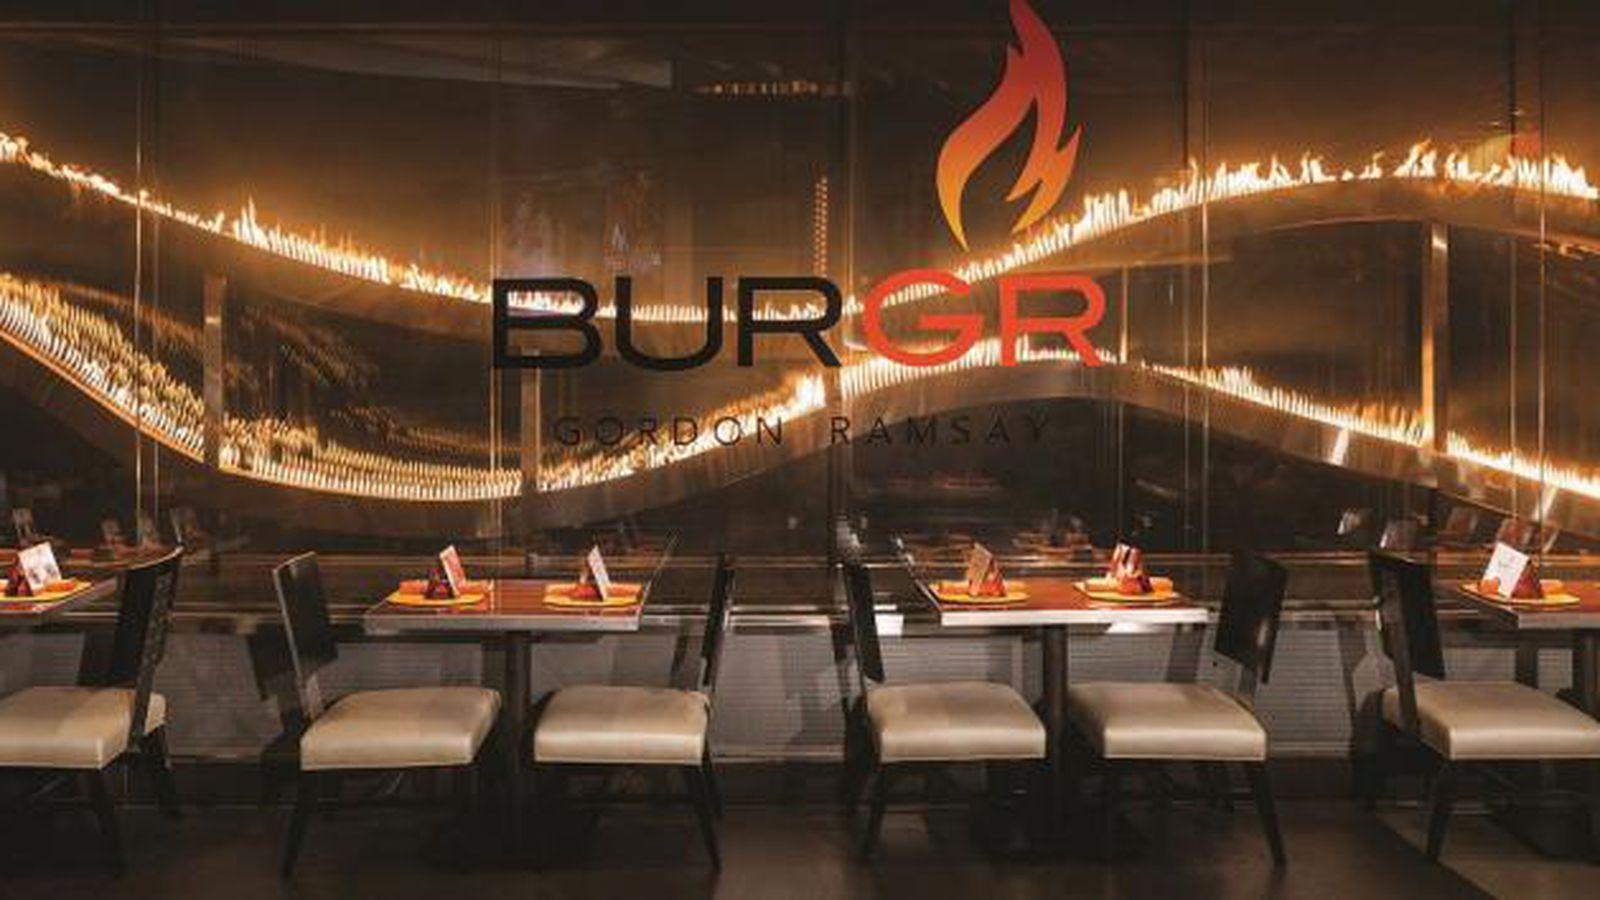 Gordon ramsay burgr goes pork new cocktails eater vegas - Gordon ramsay cuisine cool ...